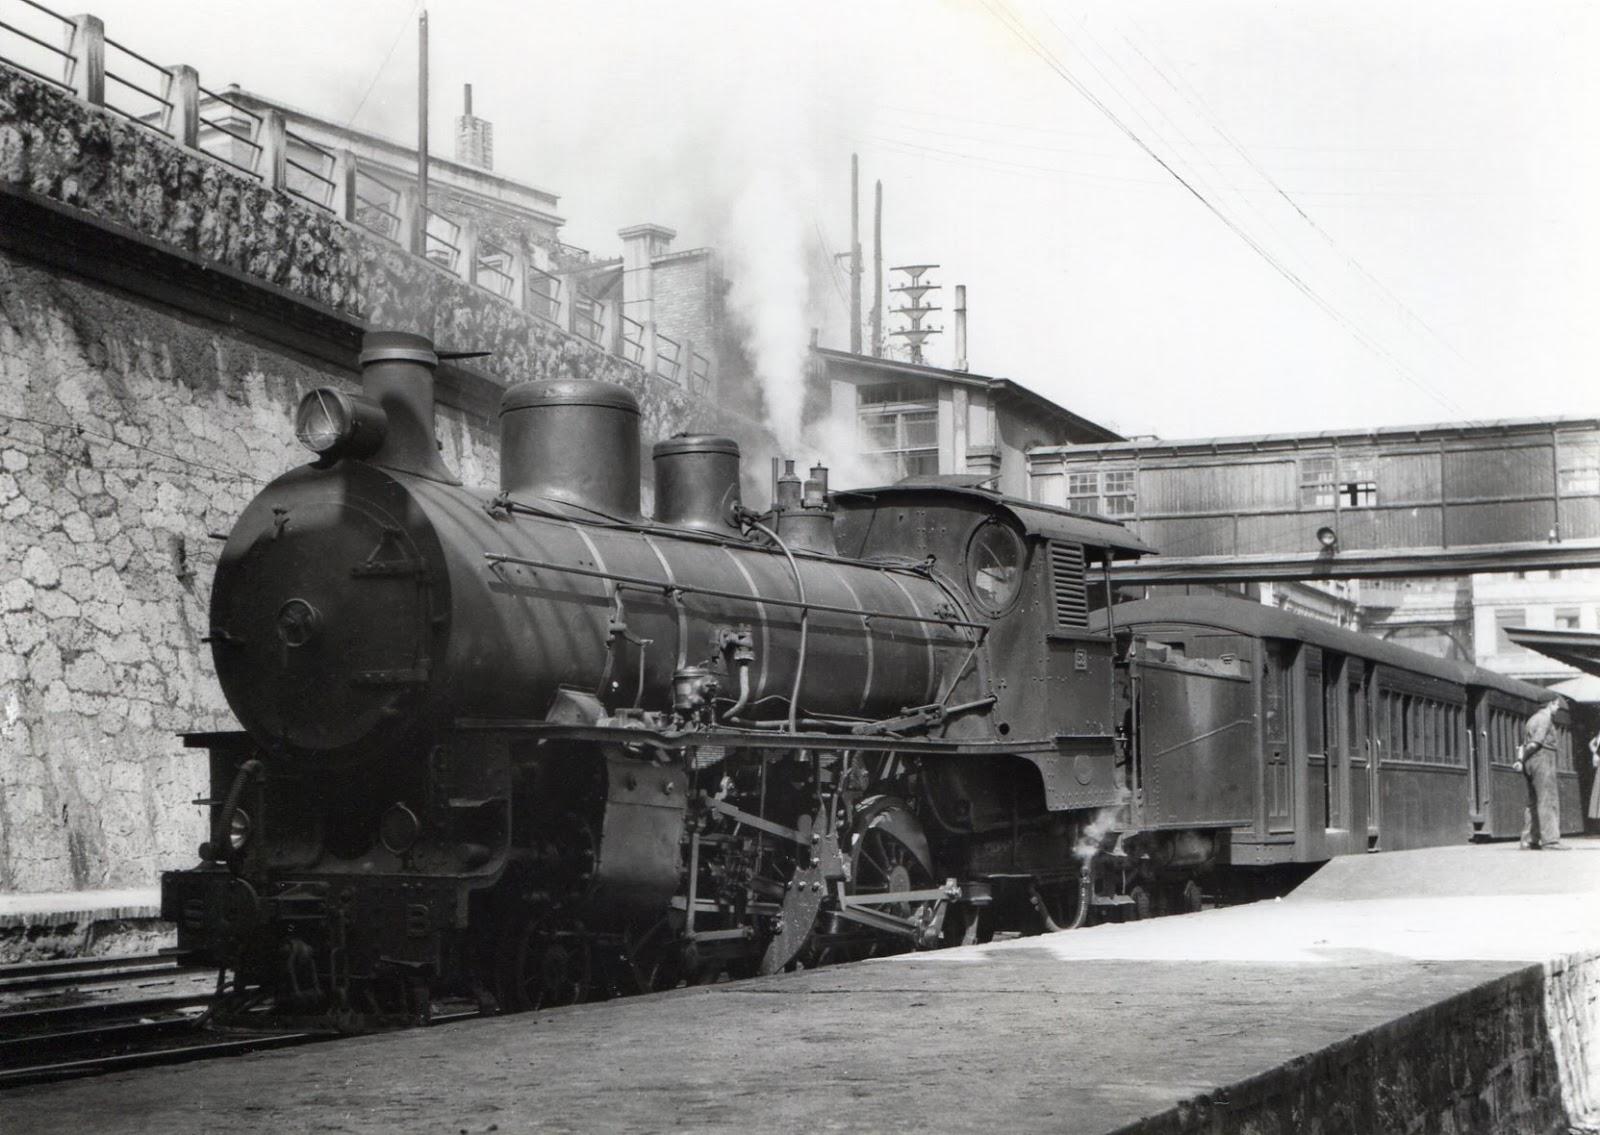 Locomotora Engerth de Vascongados , foto Jonh Blyth